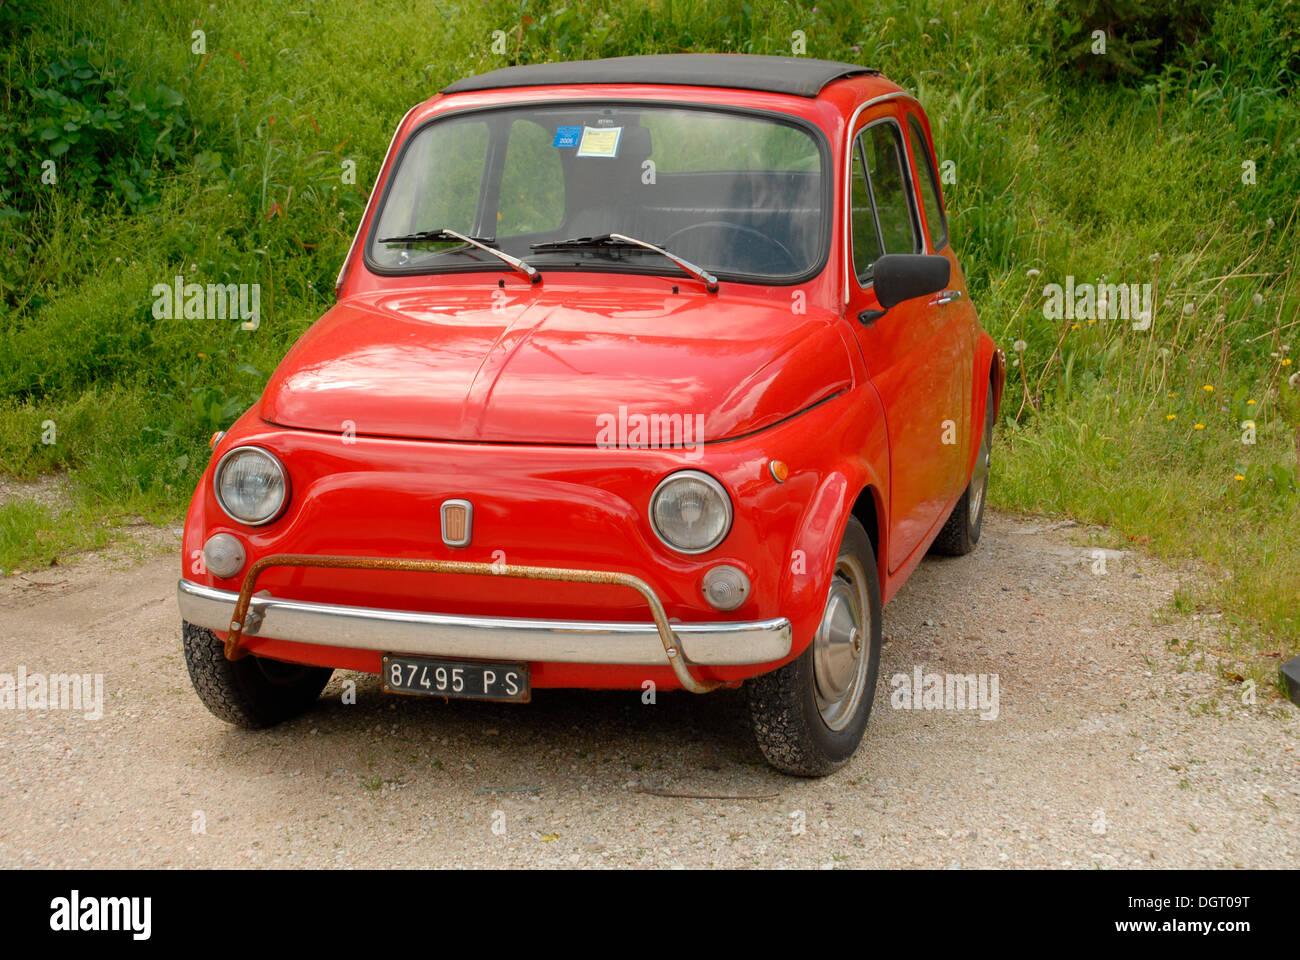 Old Fiat 500 Classic Car Pesaro Italy Europe Stock Photo